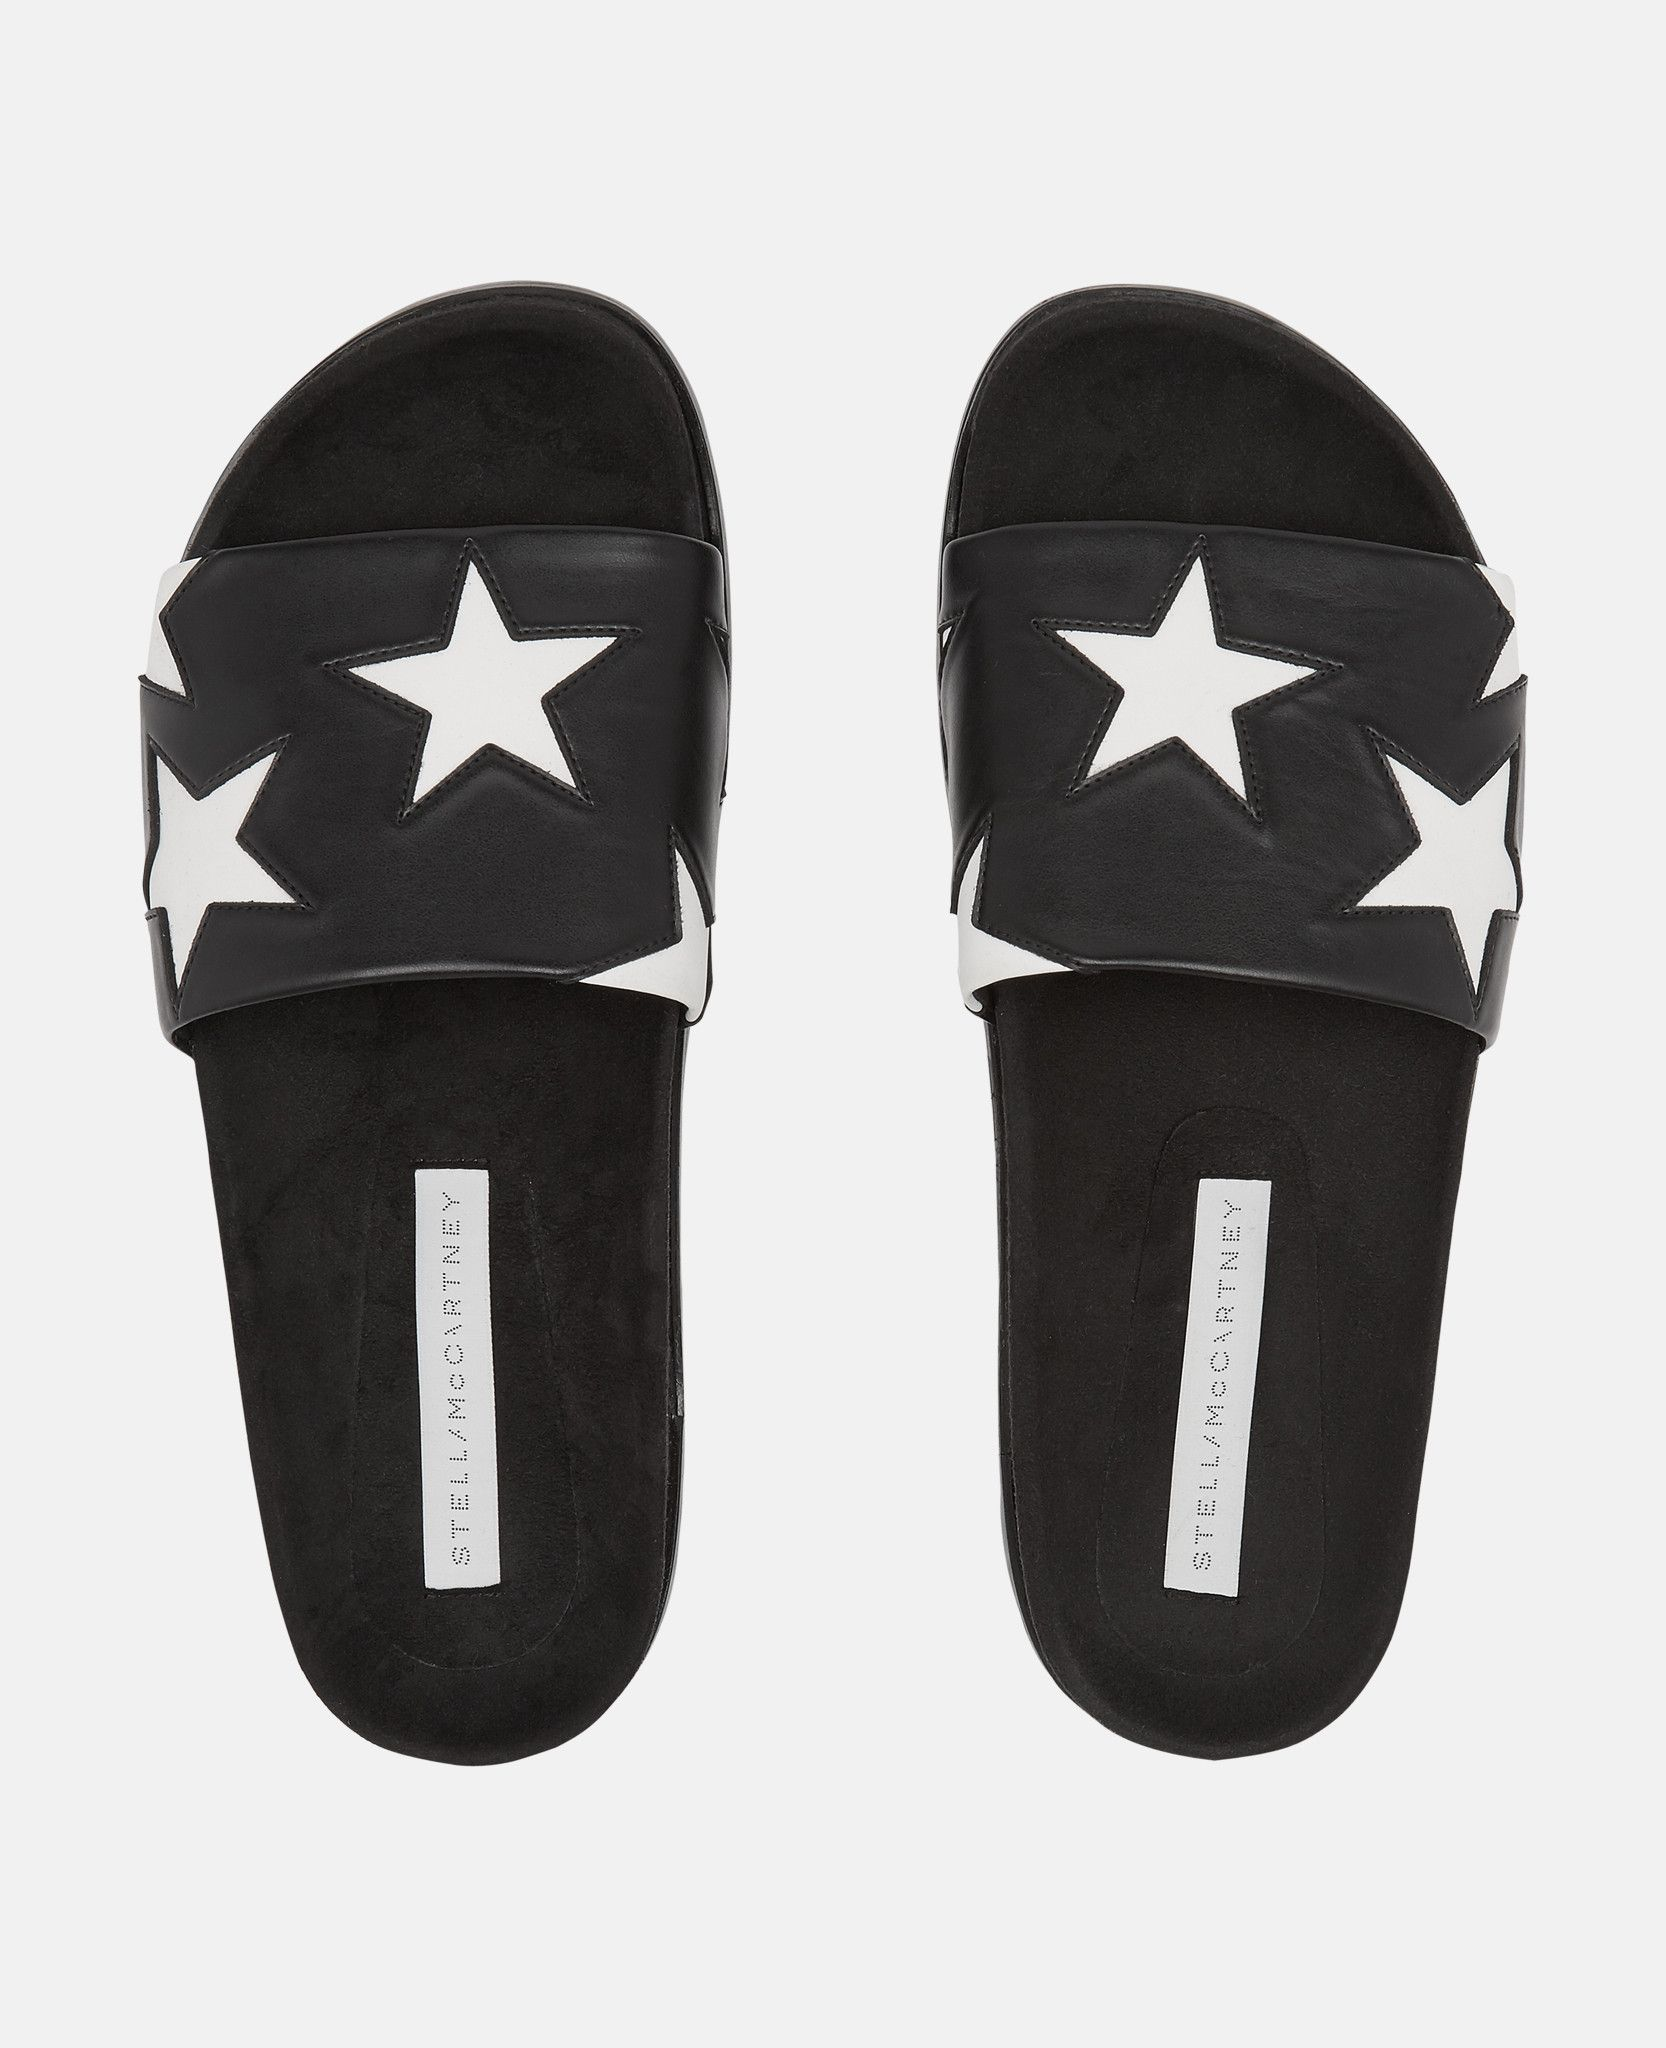 ad3dc80dca8  Black   White Star Slides - Stella Mccartney 